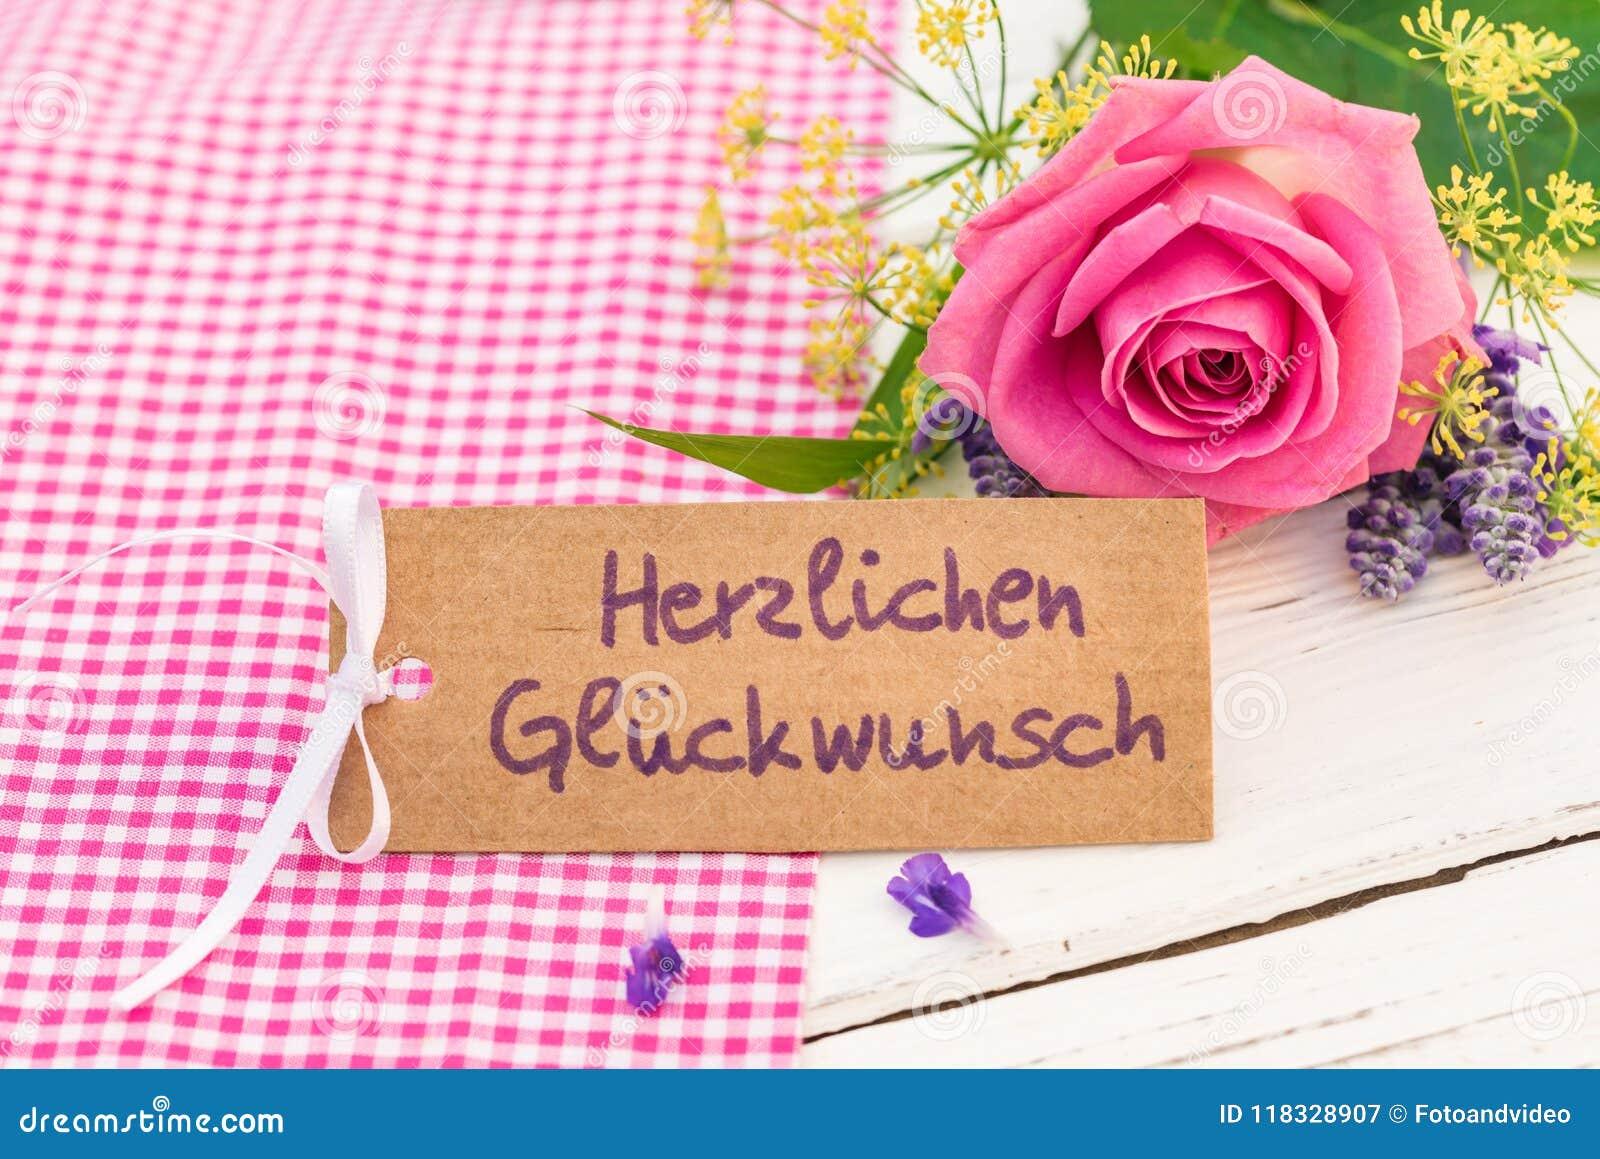 Congratulation card with german text, Herzlichen Glueckwunsch, means congratulation and pink rose flower